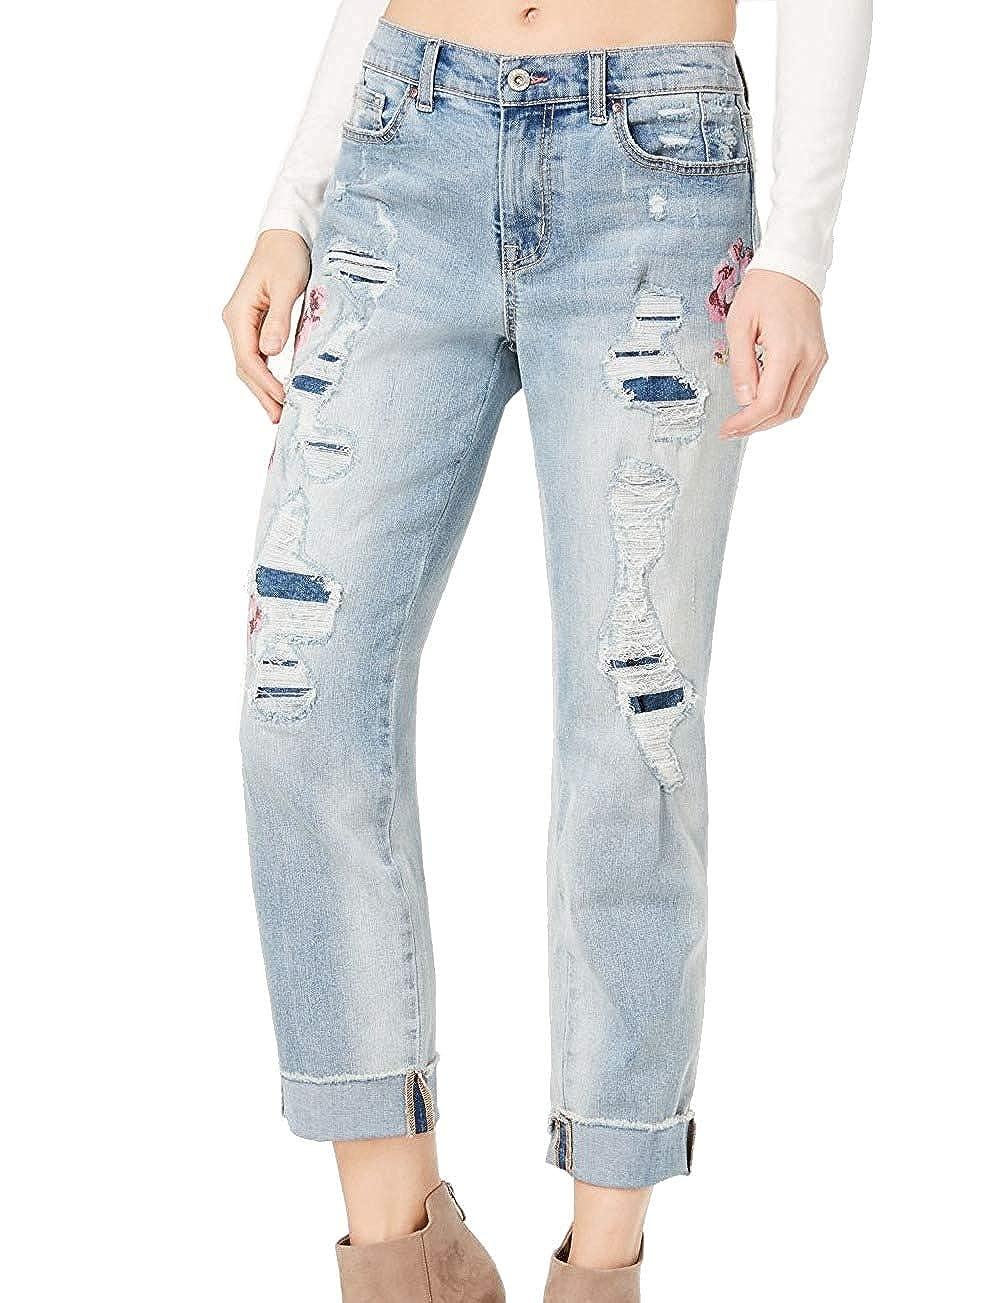 Jessica Simpson Women's Mika Ripped Boyfriend Jeans Rambler 32 bluees